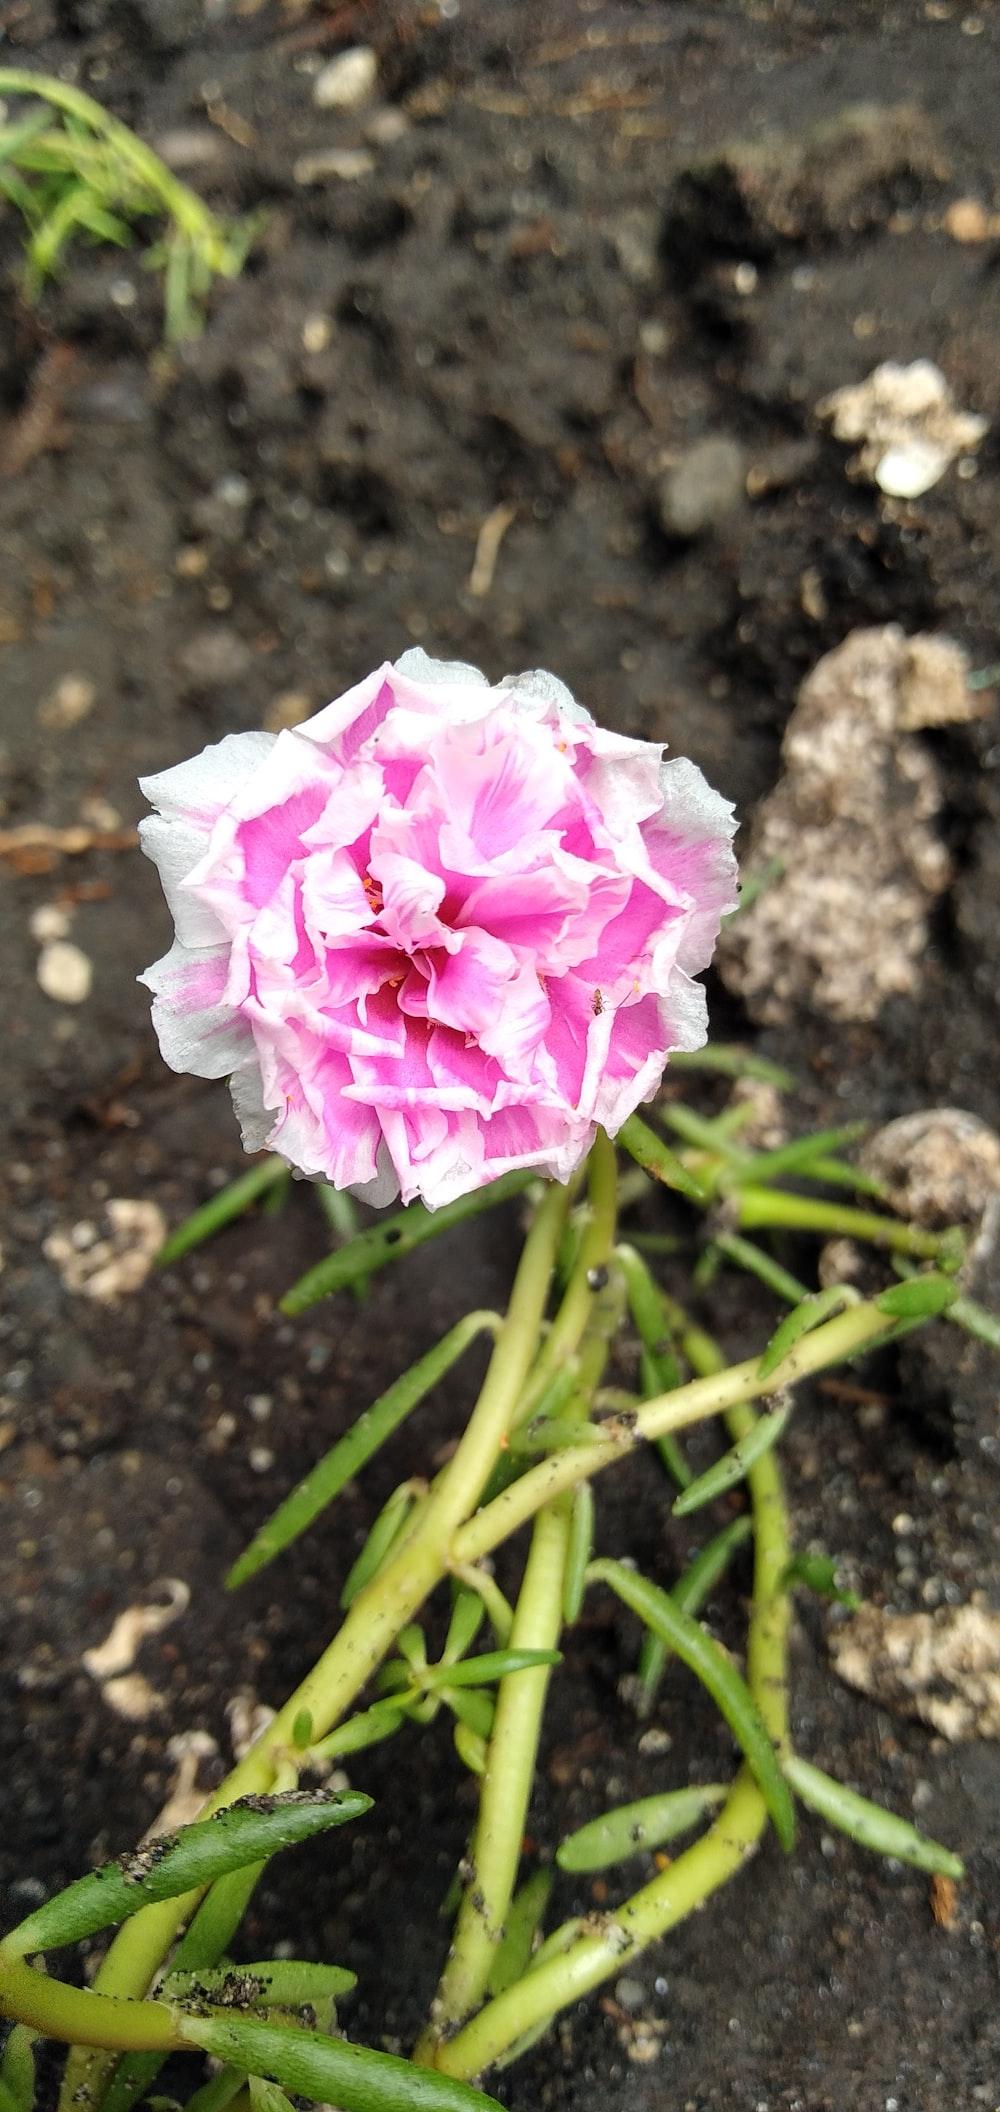 pink petaled flower during daytime